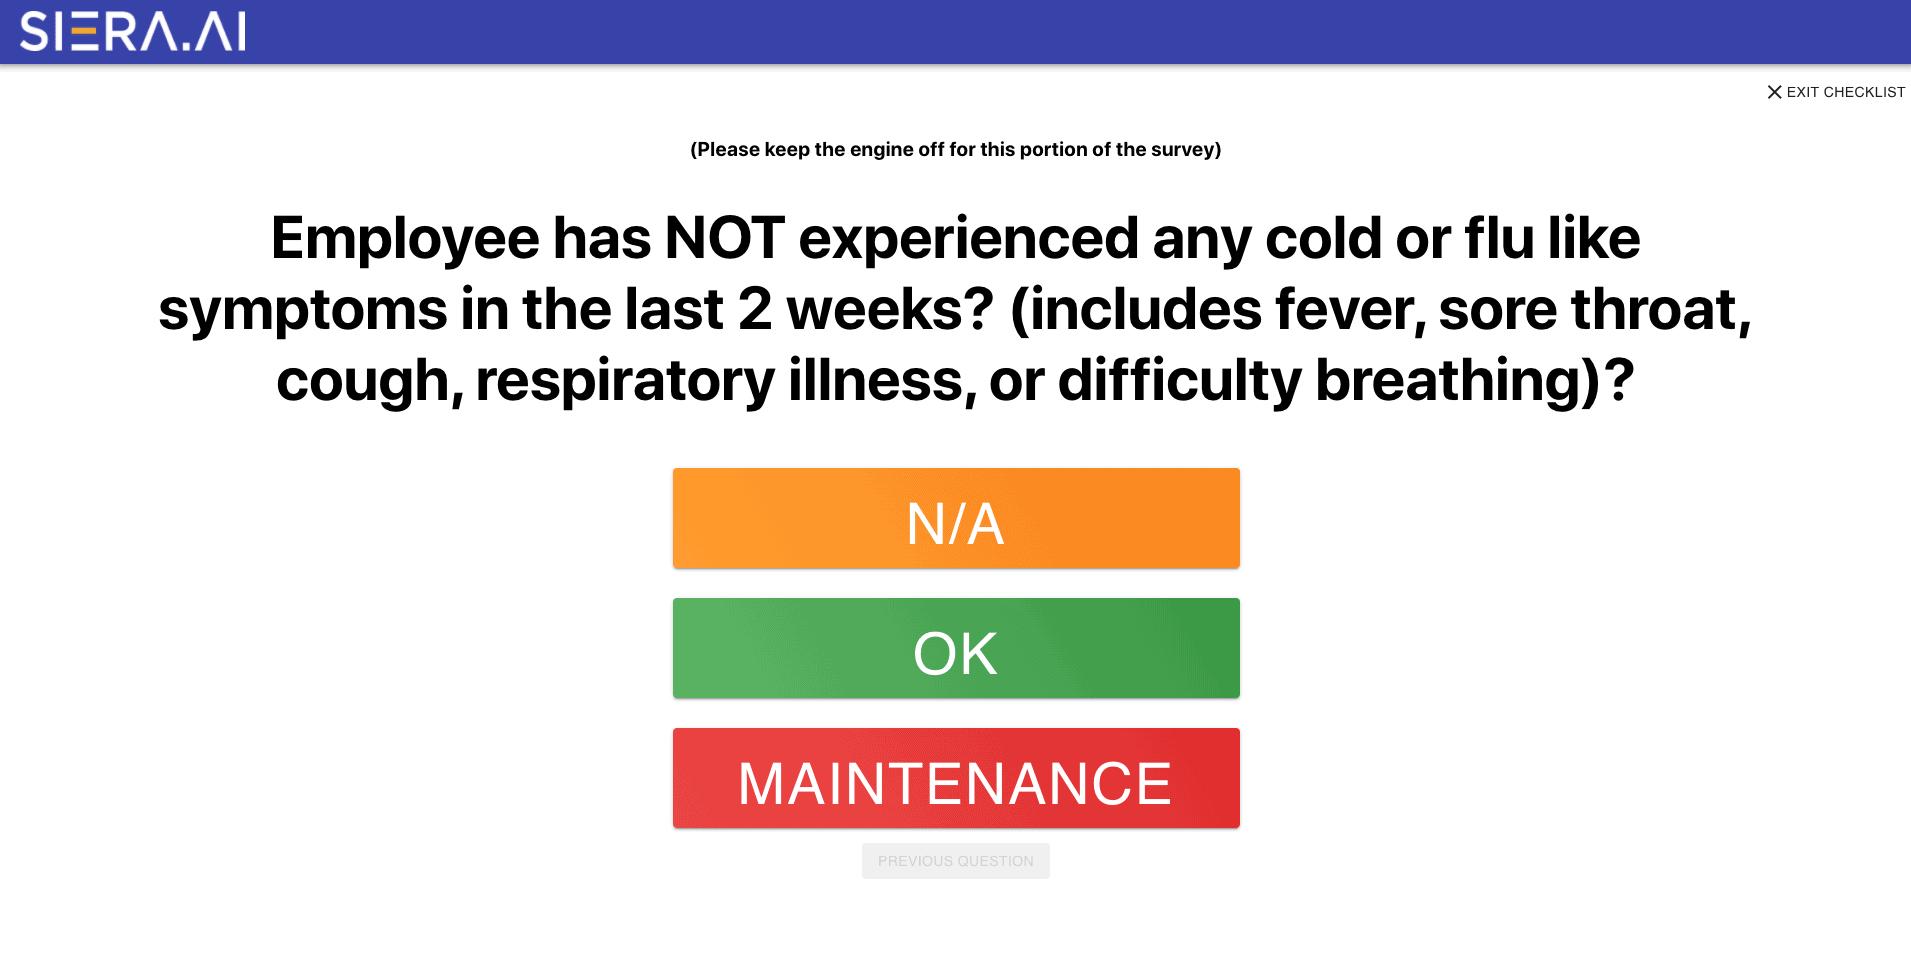 COVID-19 symptom screening question.